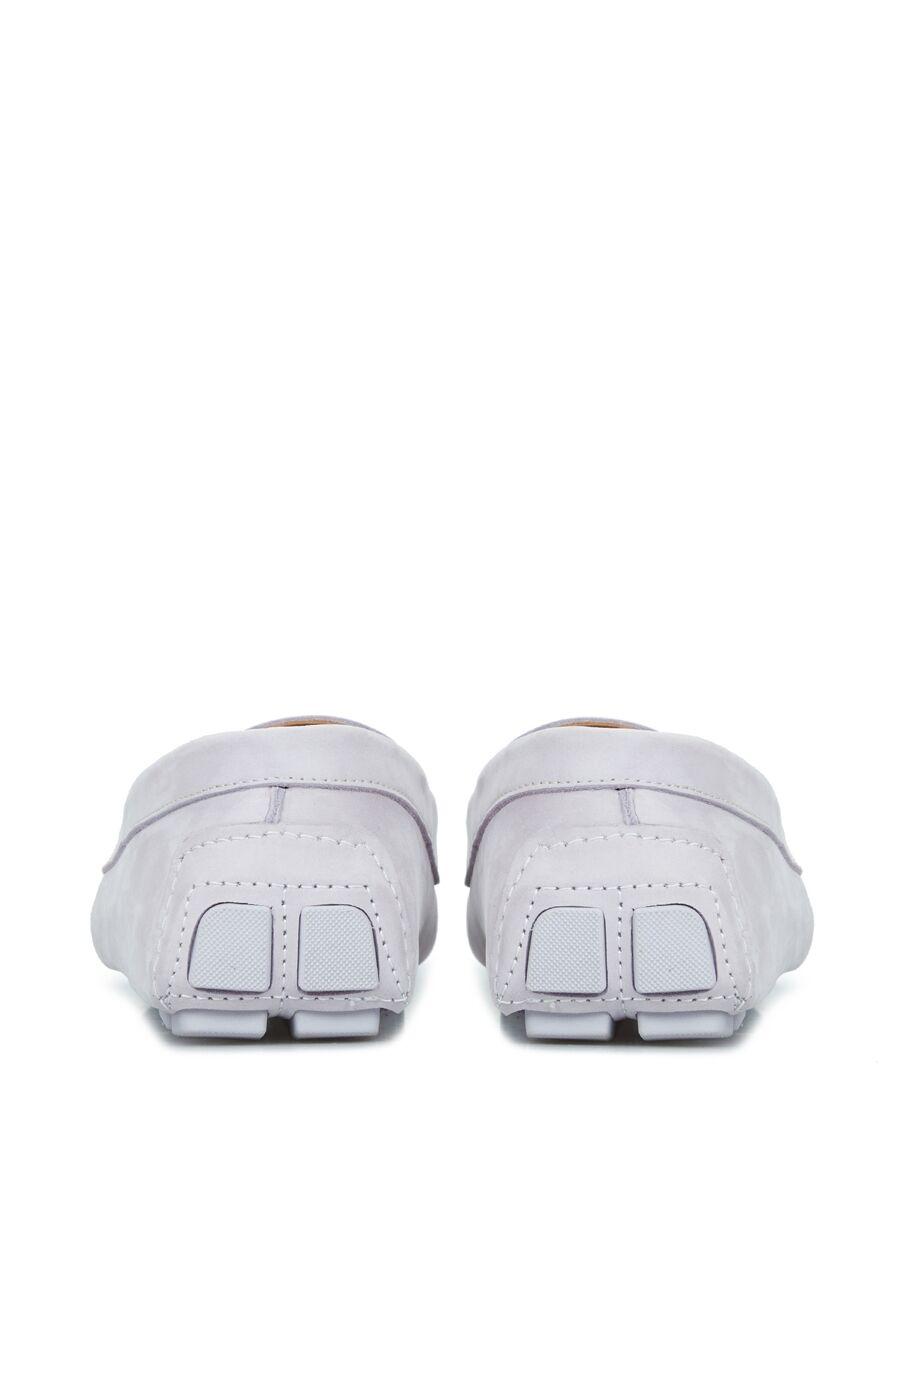 Beyaz Bant Detaylı Erkek Loafer